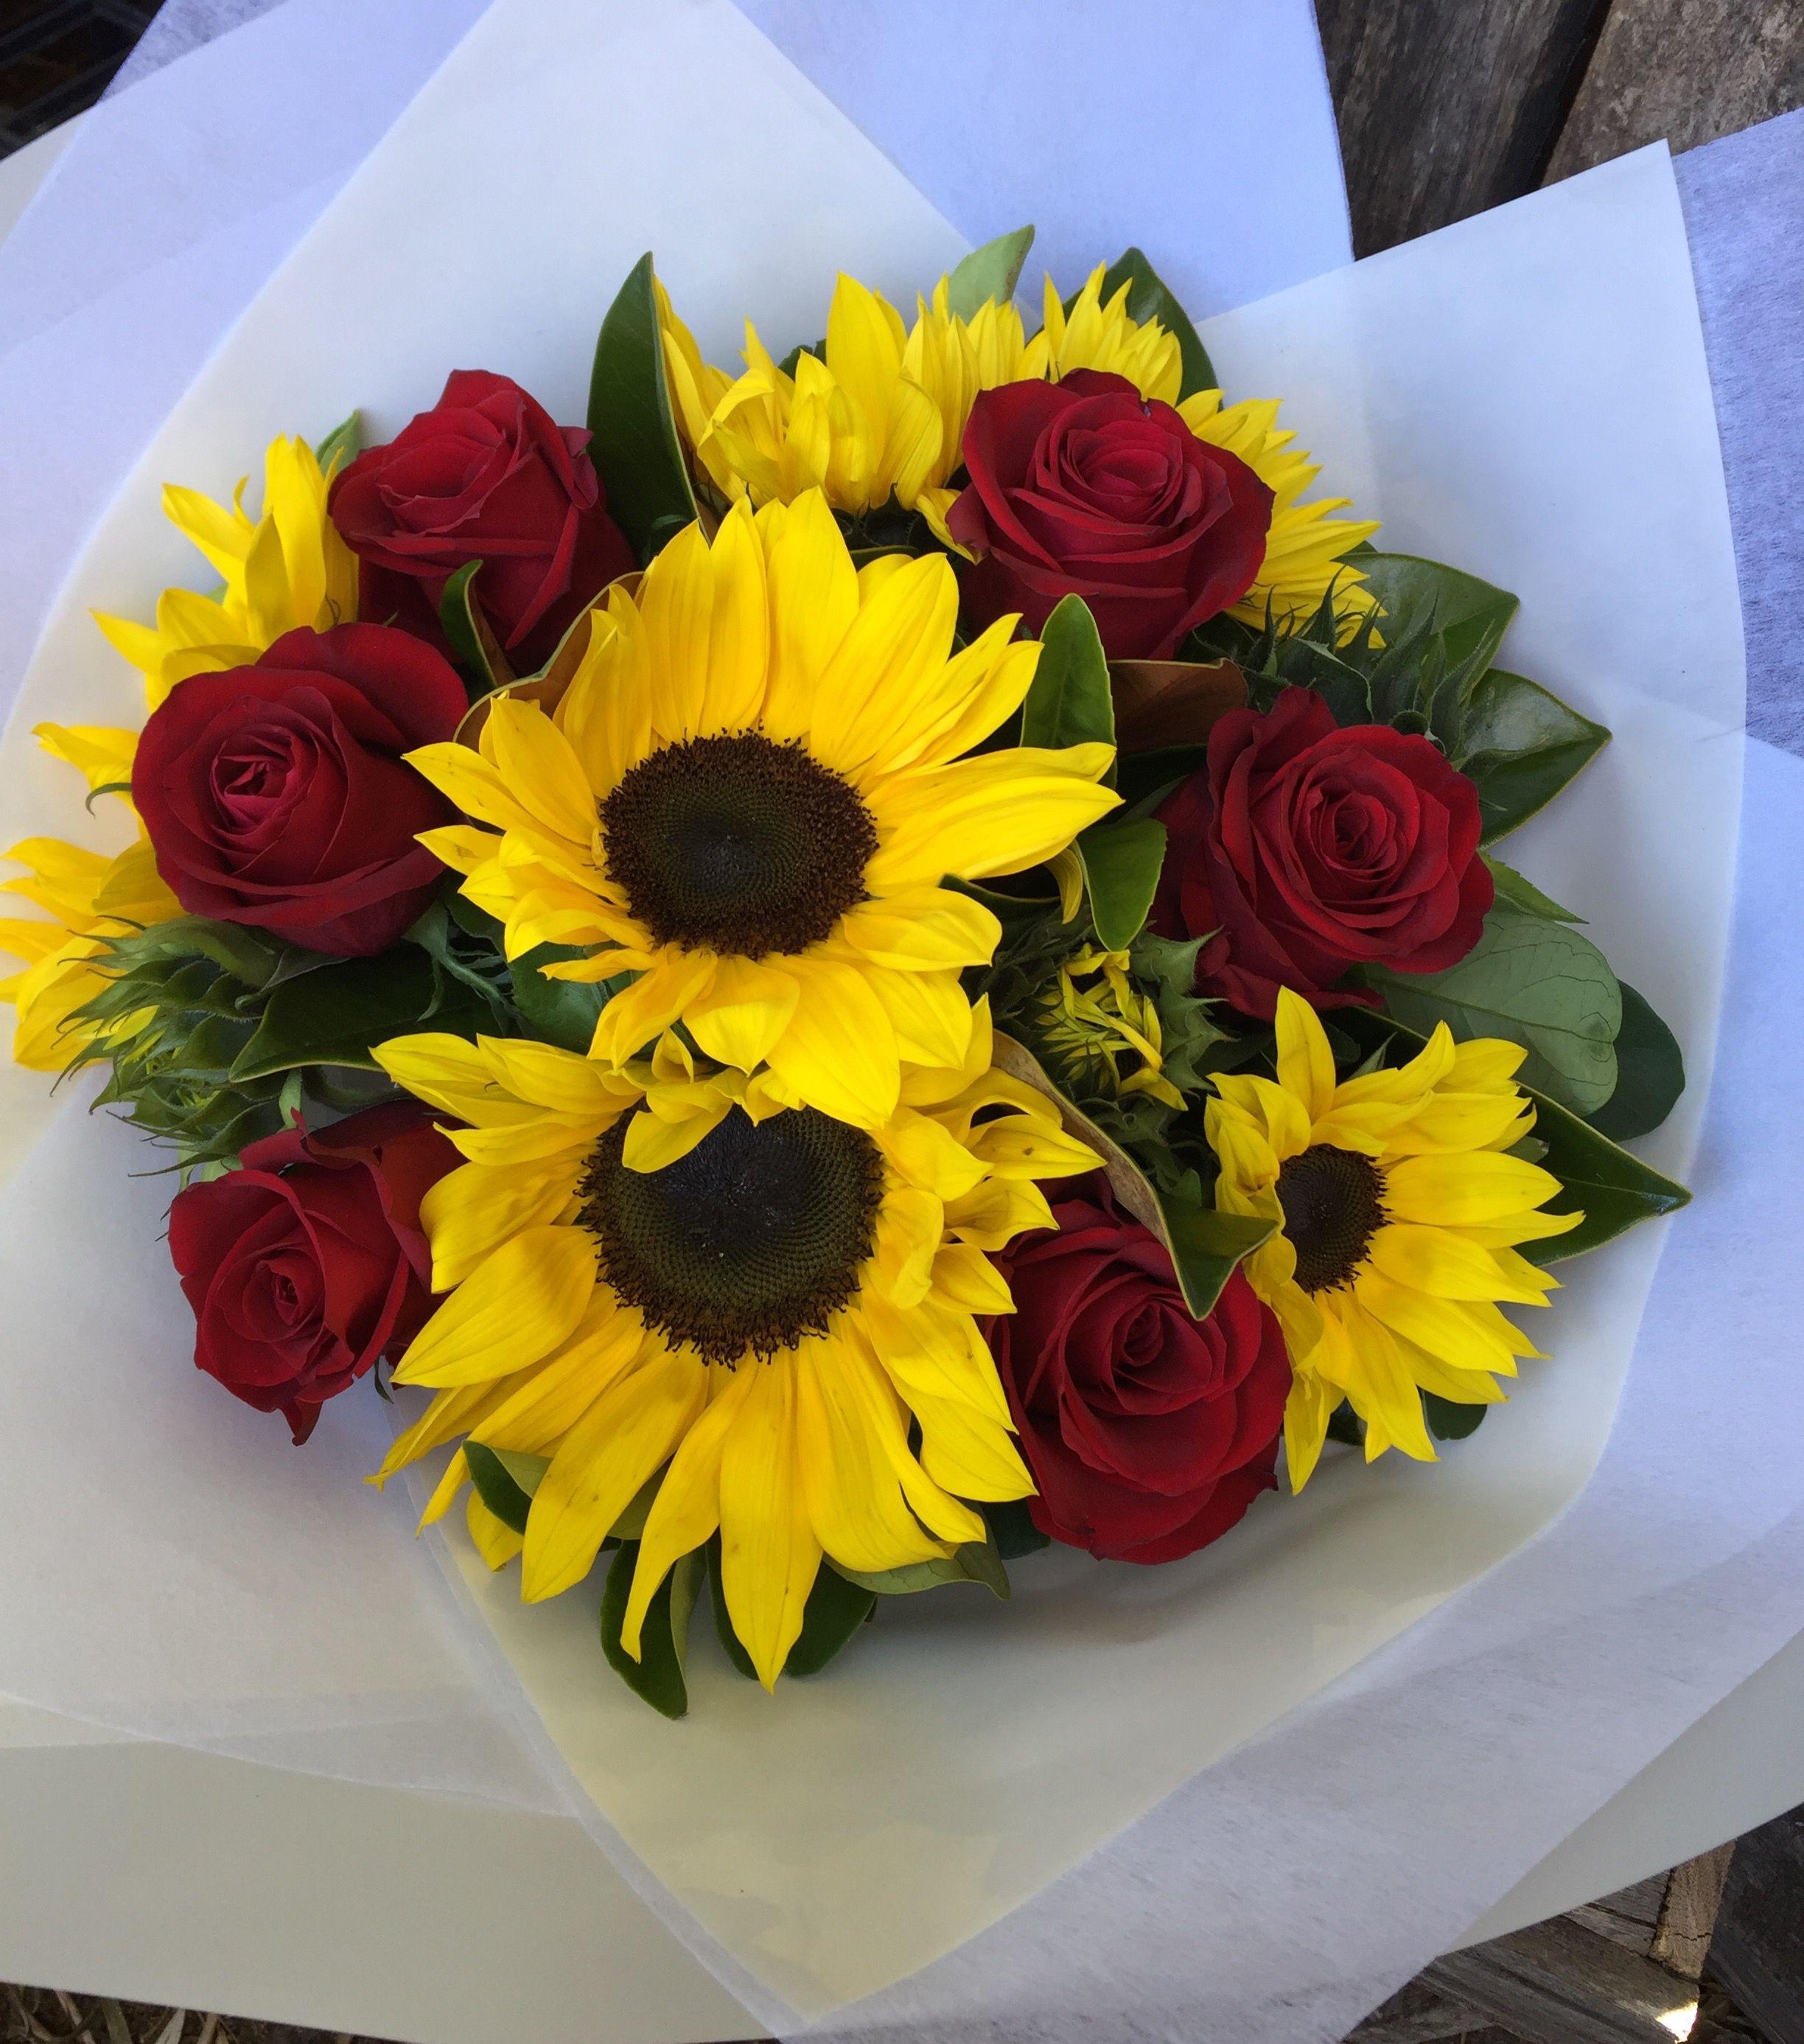 Wedding Flower Arrangements Pinterest: The Flower Manor Sunflowers And Red Rose Hand Held Bouquet